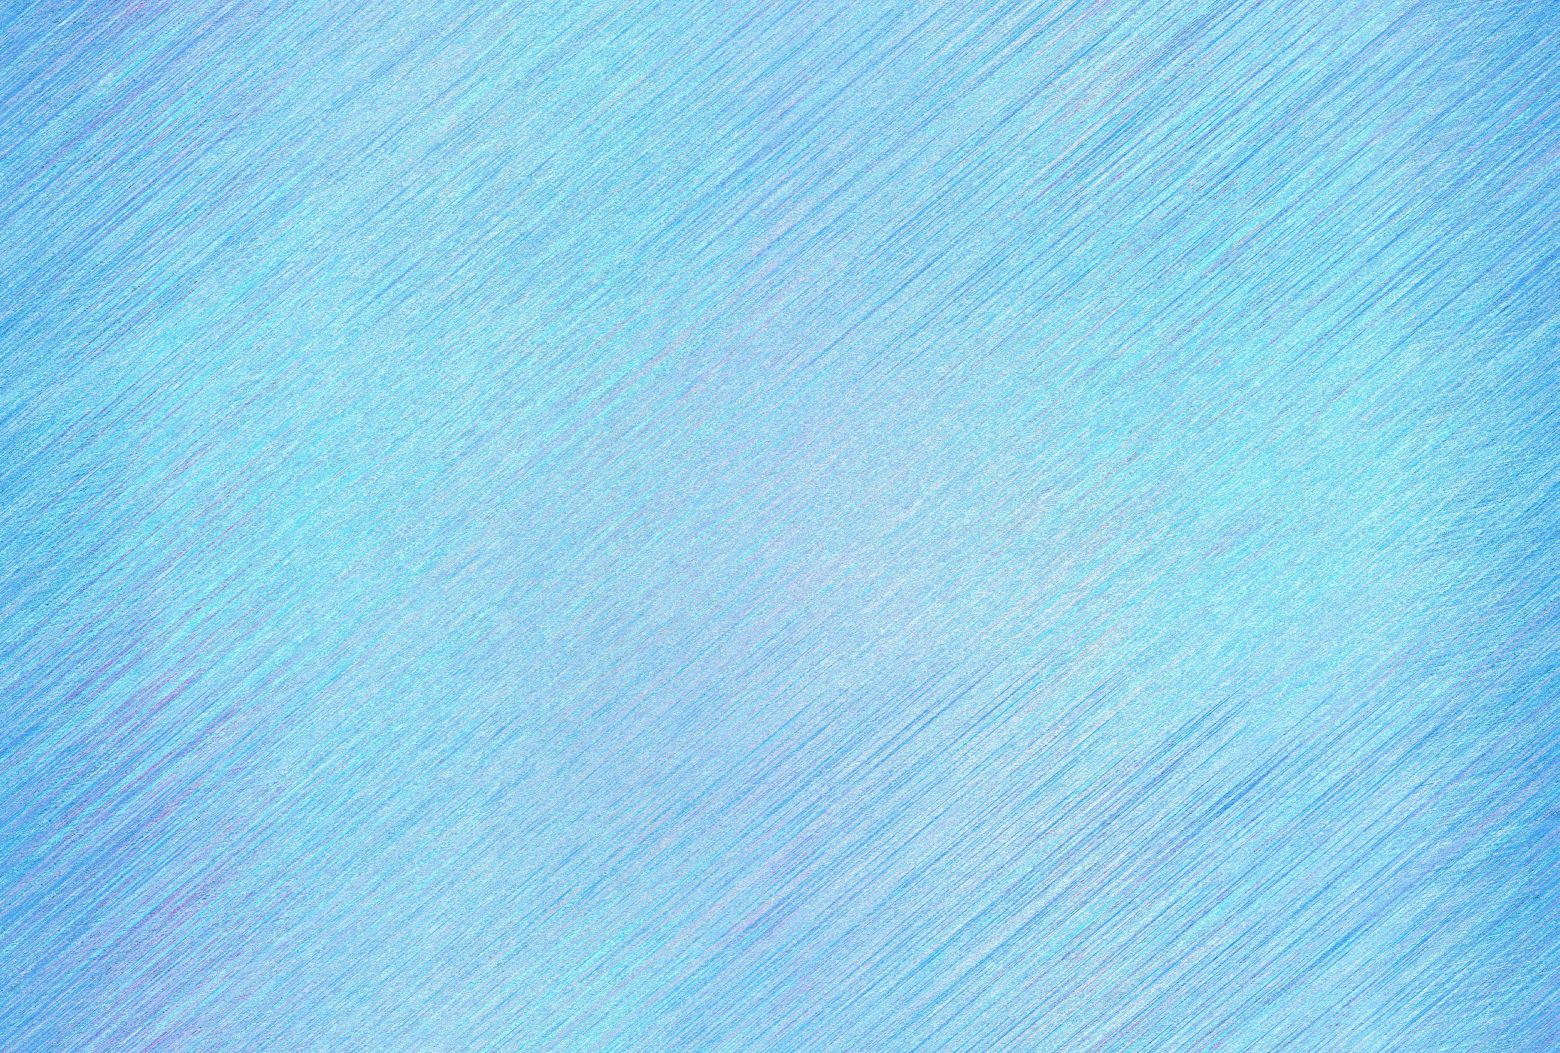 background-texture-2110724